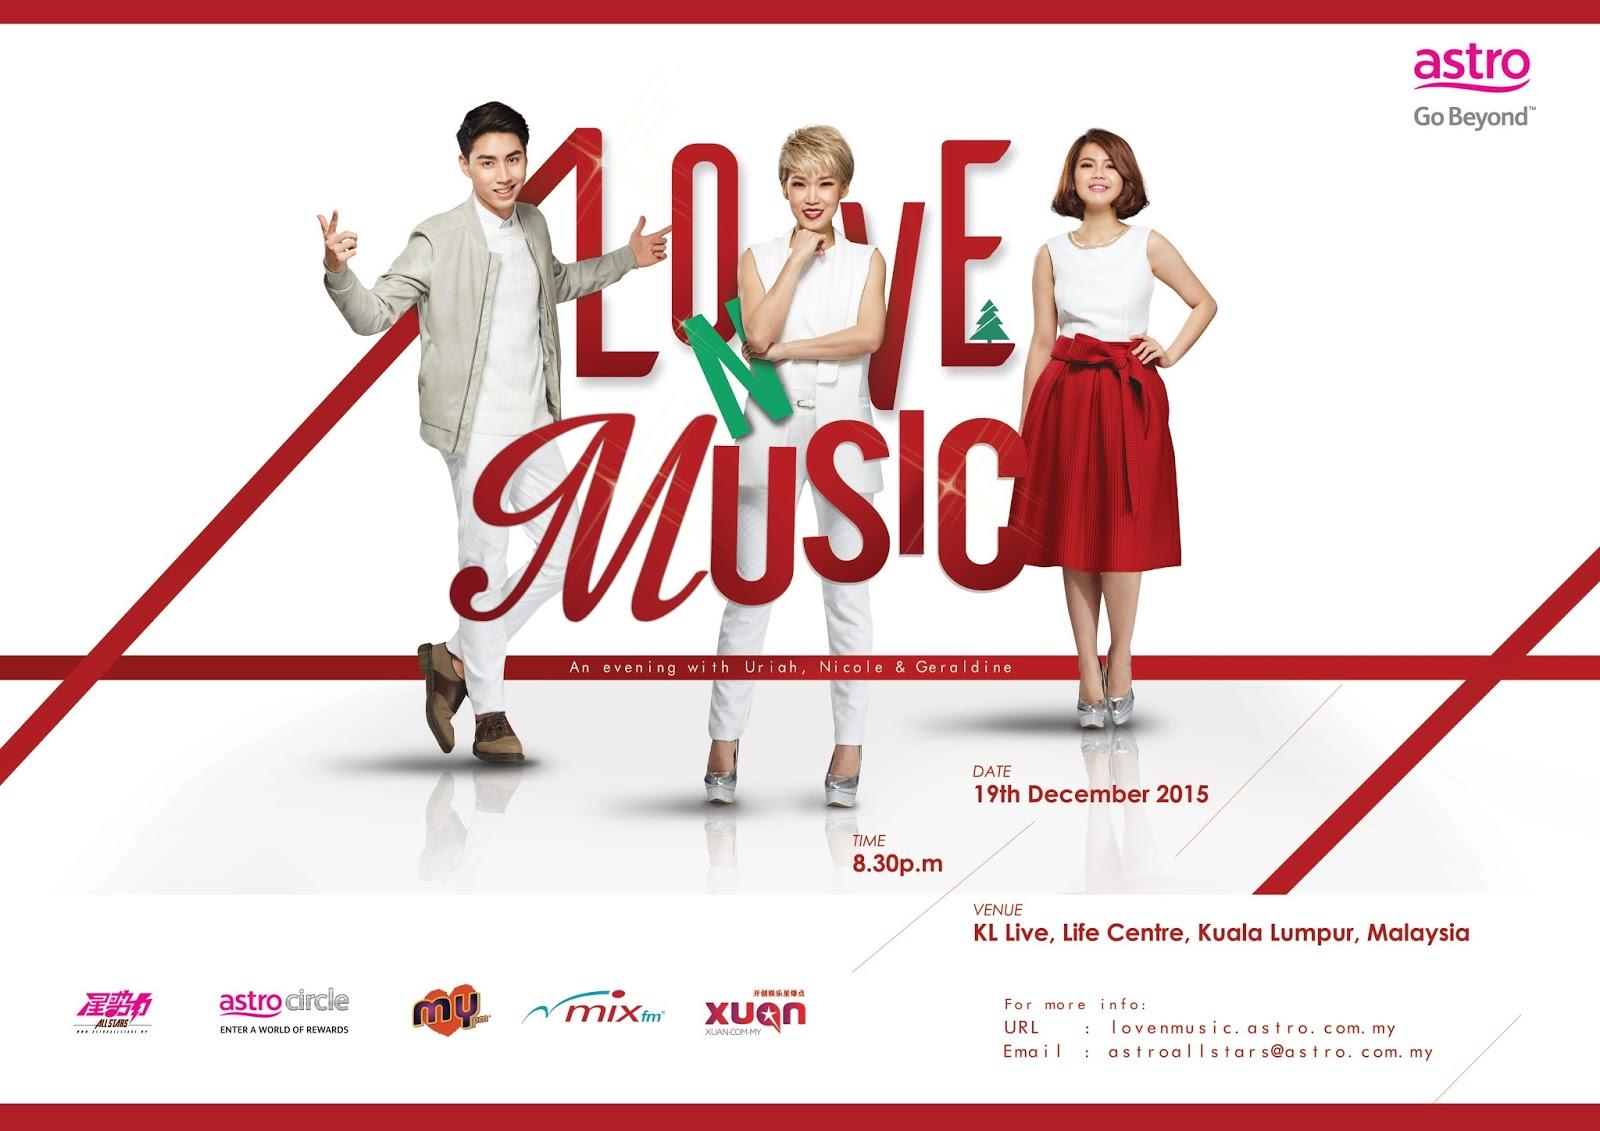 LOVE N MUSIC CONCERT ft Geraldine Gan, Nicole Lai and Uriah